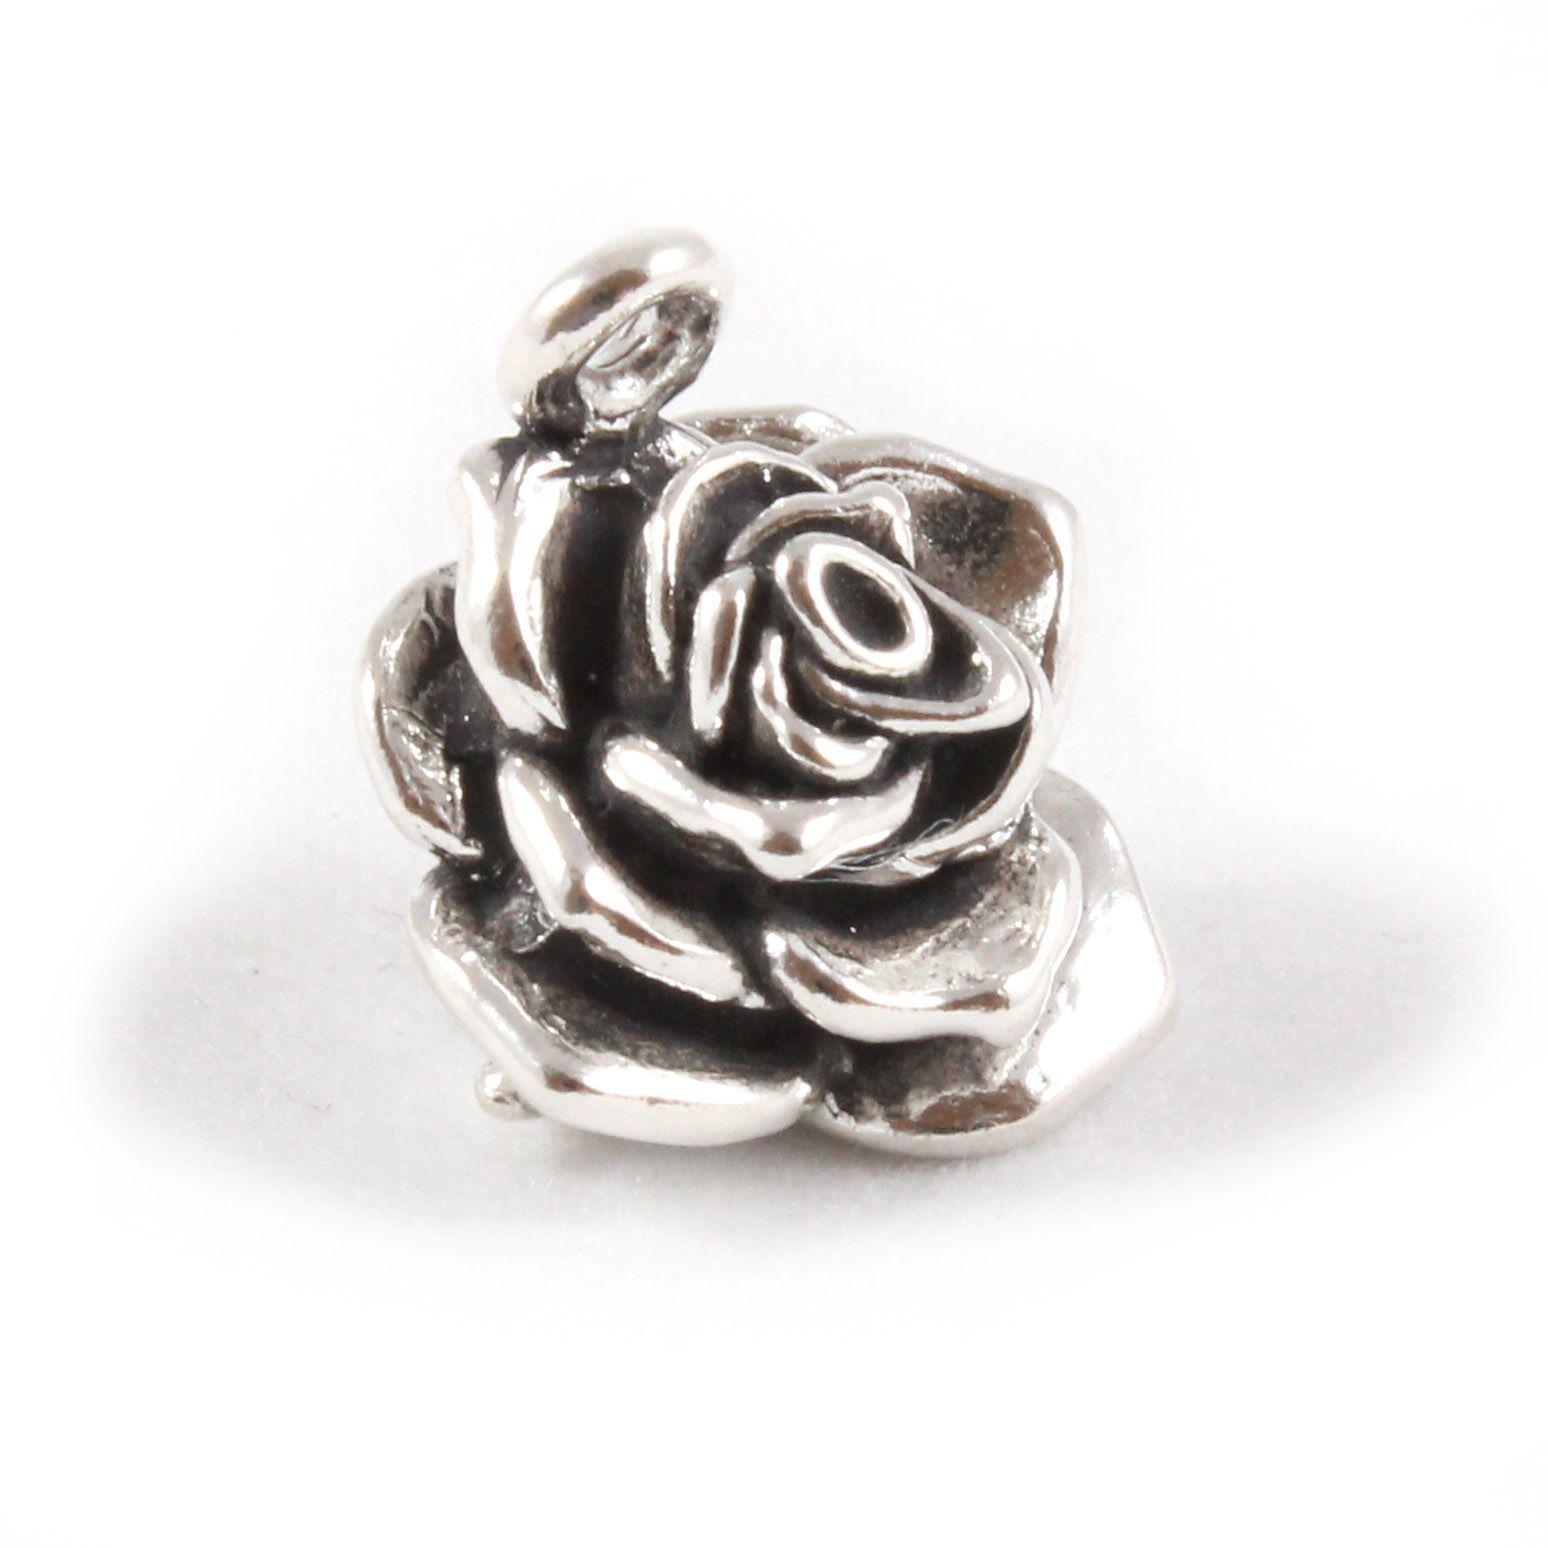 Charm School Uk Gt Sterling Silver Charms Gt Plantlife Gt Rose Flower